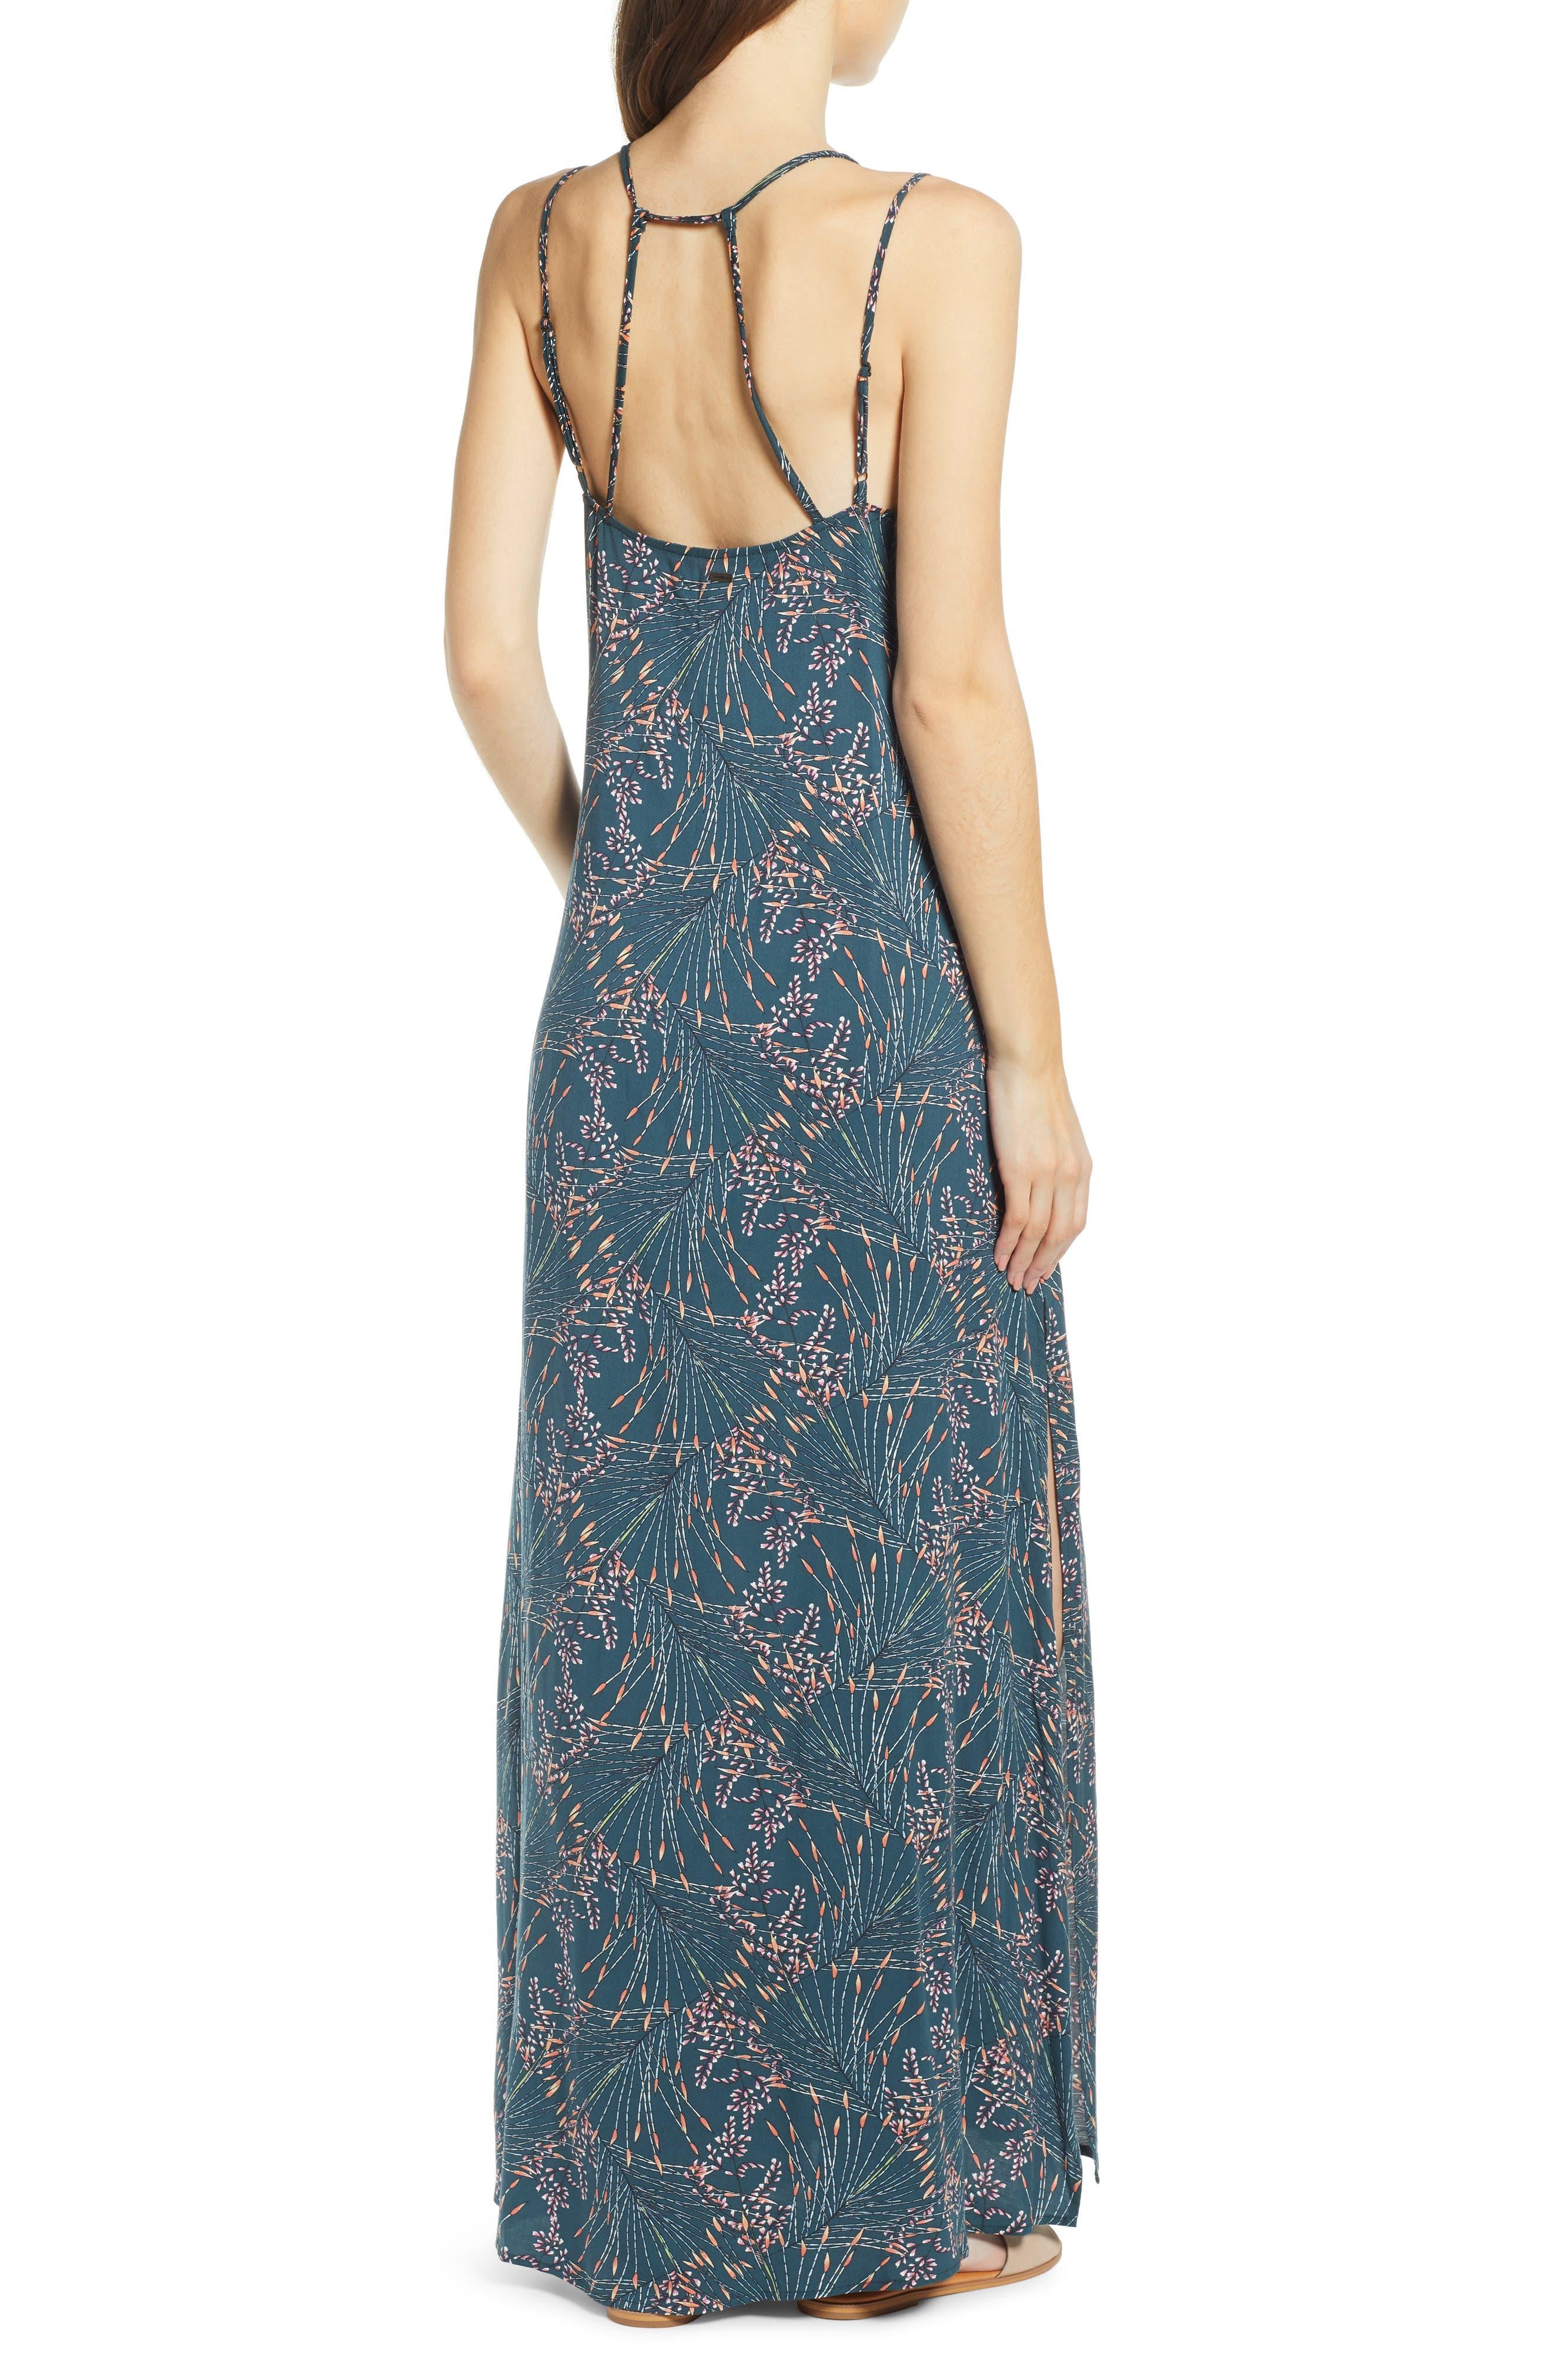 O'NEILL,                             Breanna Maxi Dress,                             Alternate thumbnail 2, color,                             STARGAZER